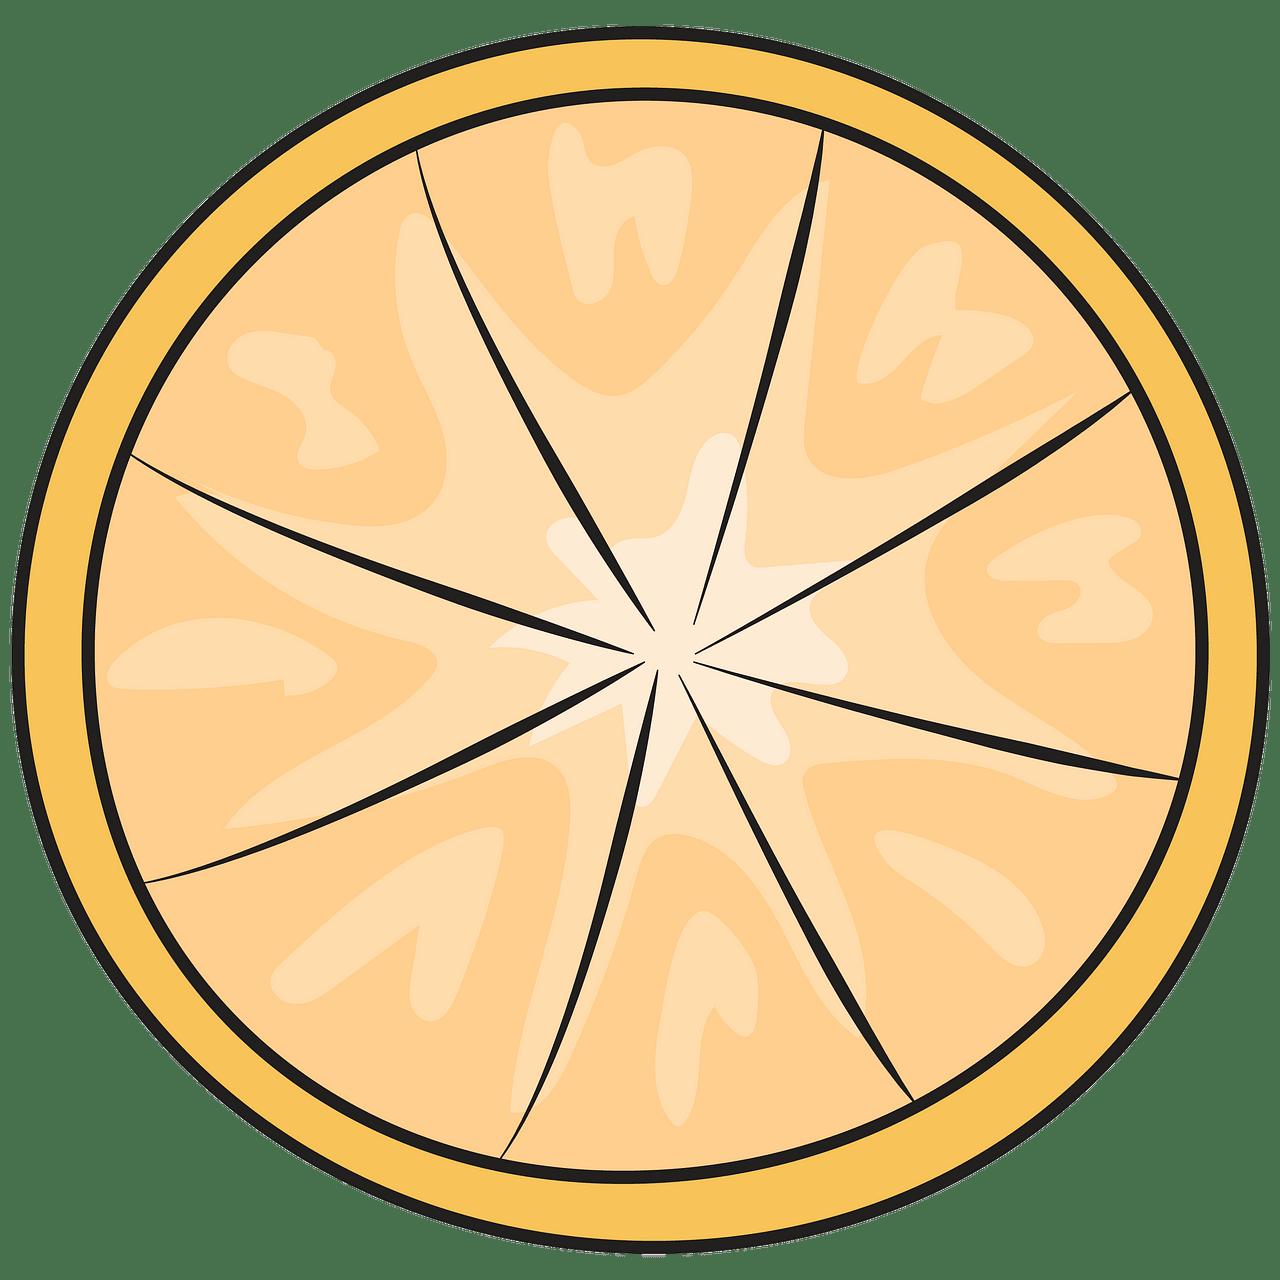 Lemon slice clipart. Free download..